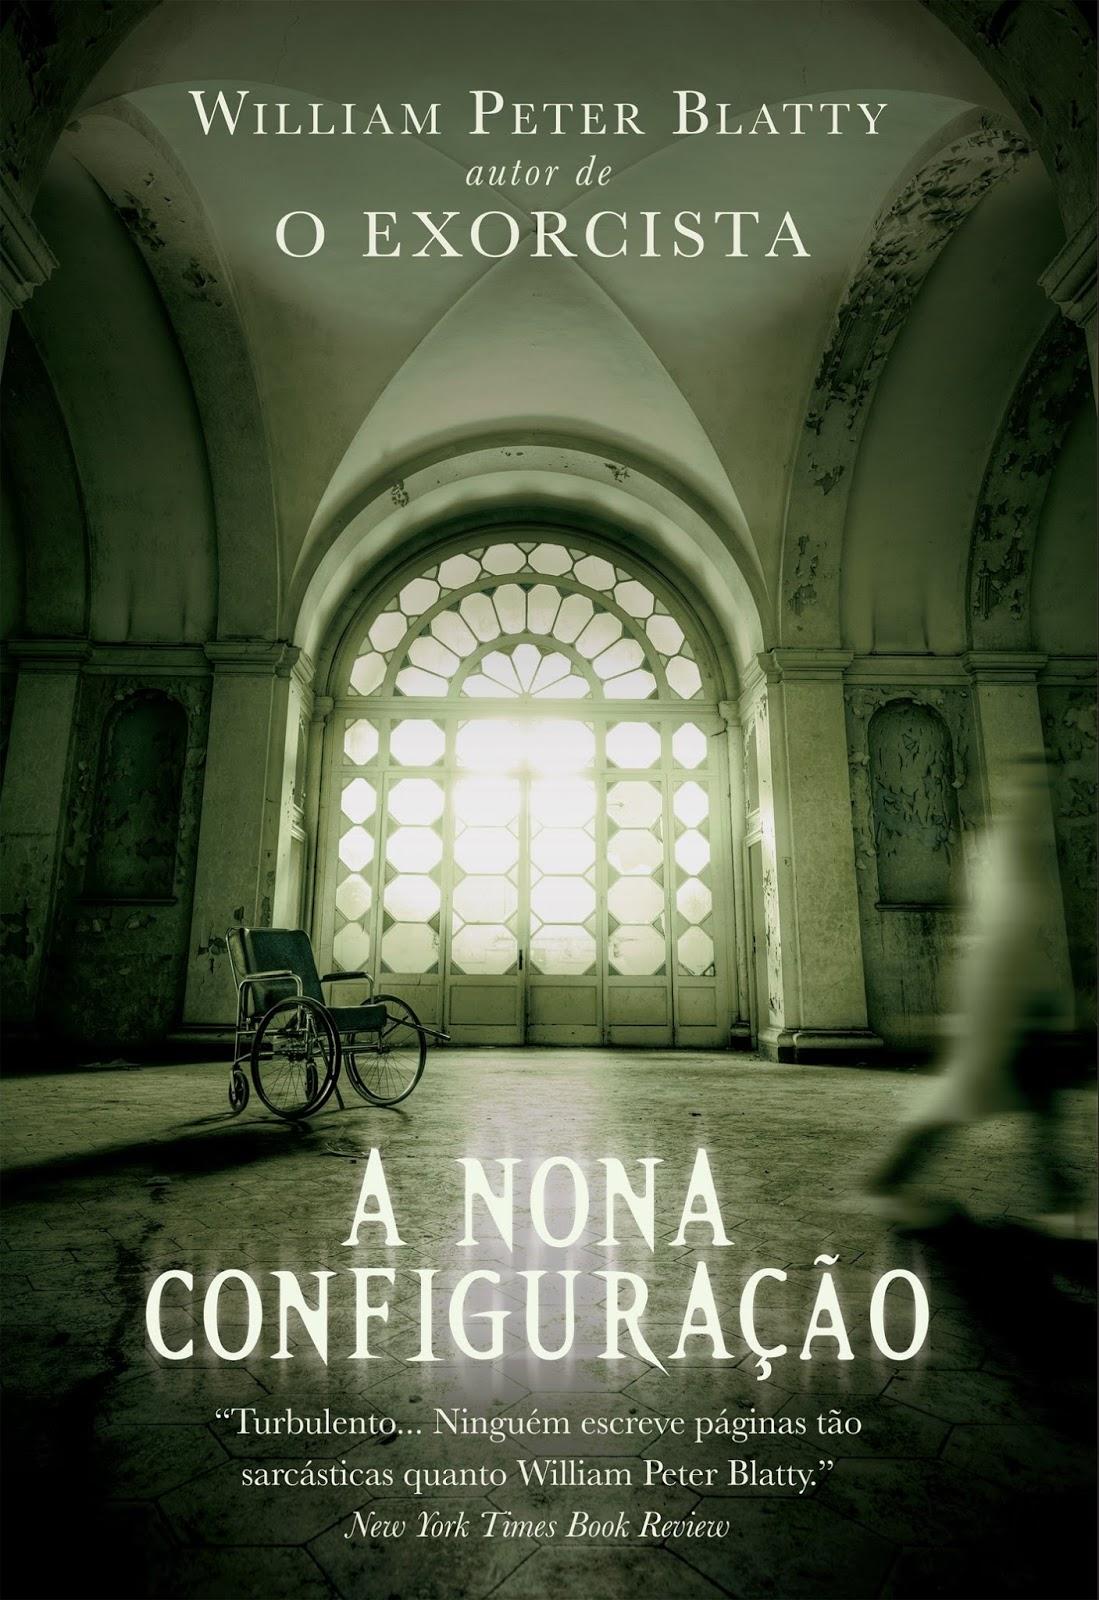 https://www.skoob.com.br/livro/47303ED529911